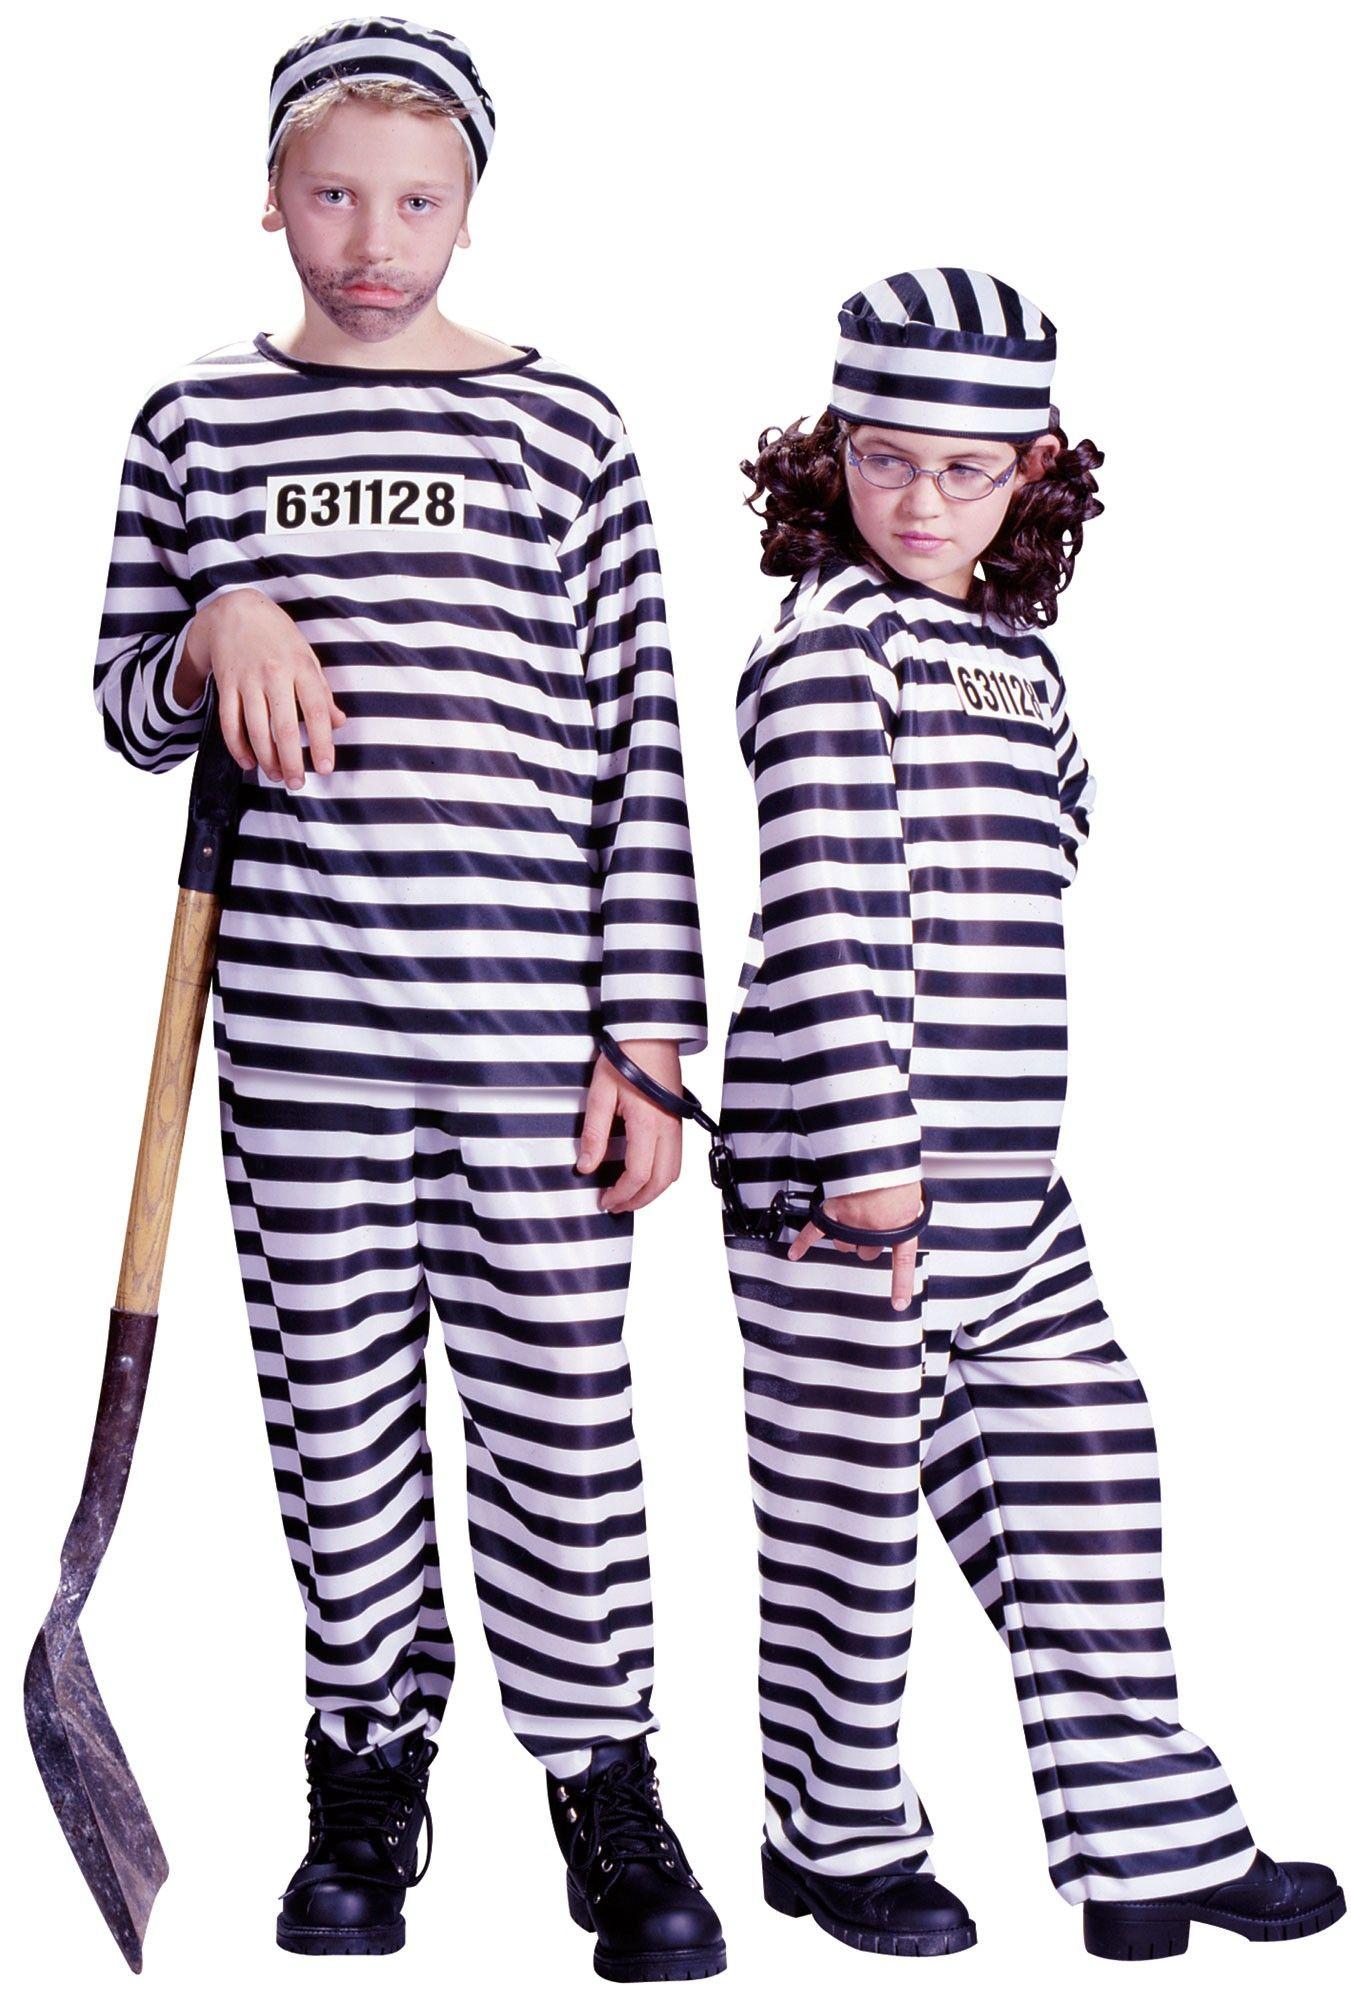 Children's Jailbird Convict Halloween Costume - This is a great ...